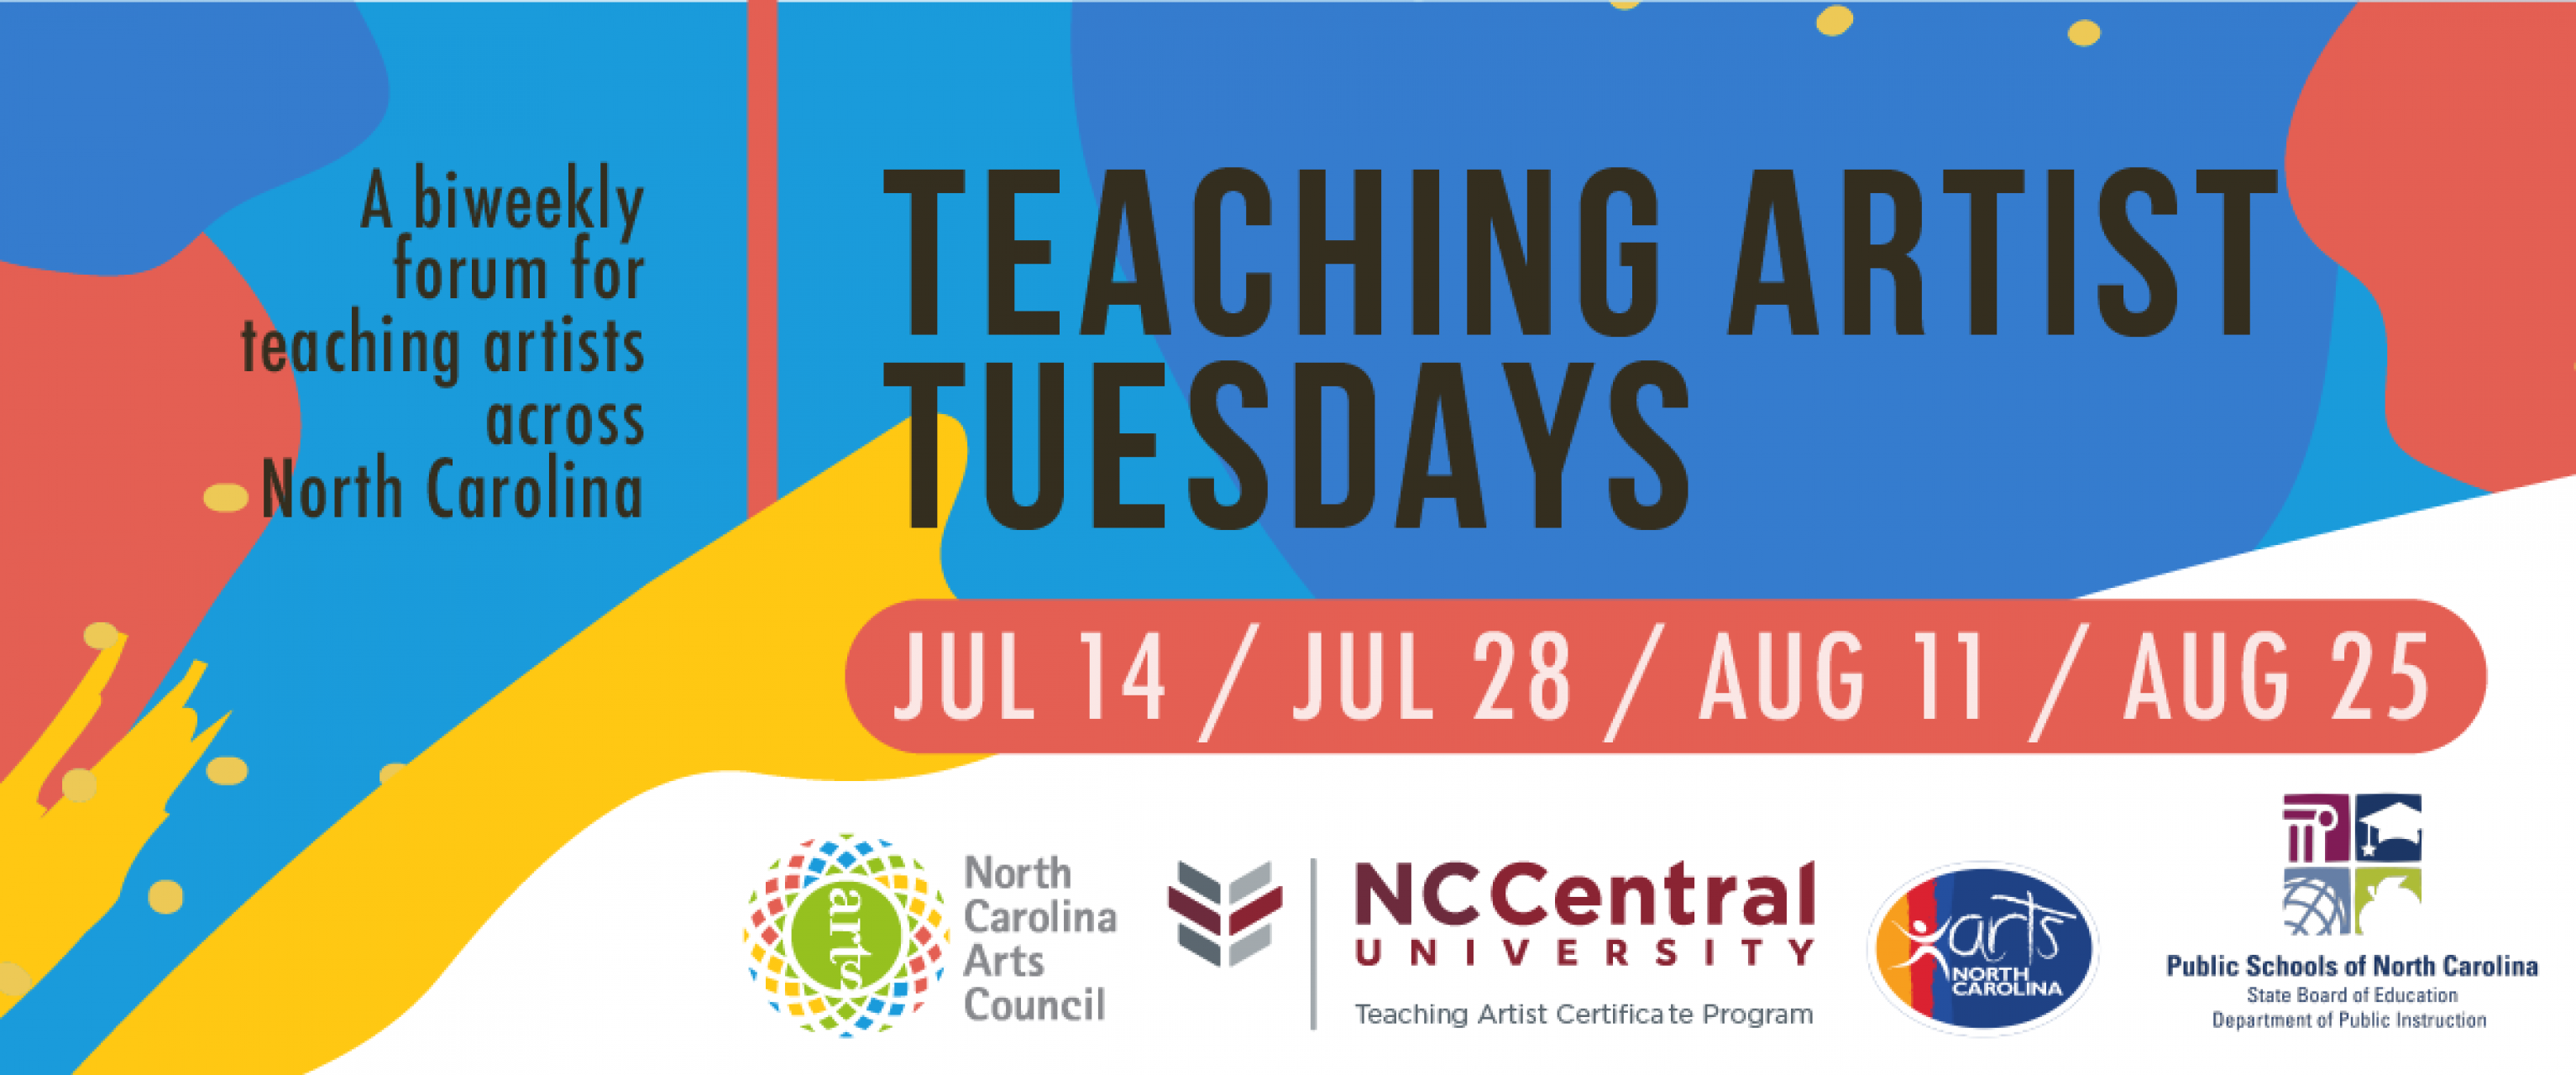 Teaching Artist Tuesdays